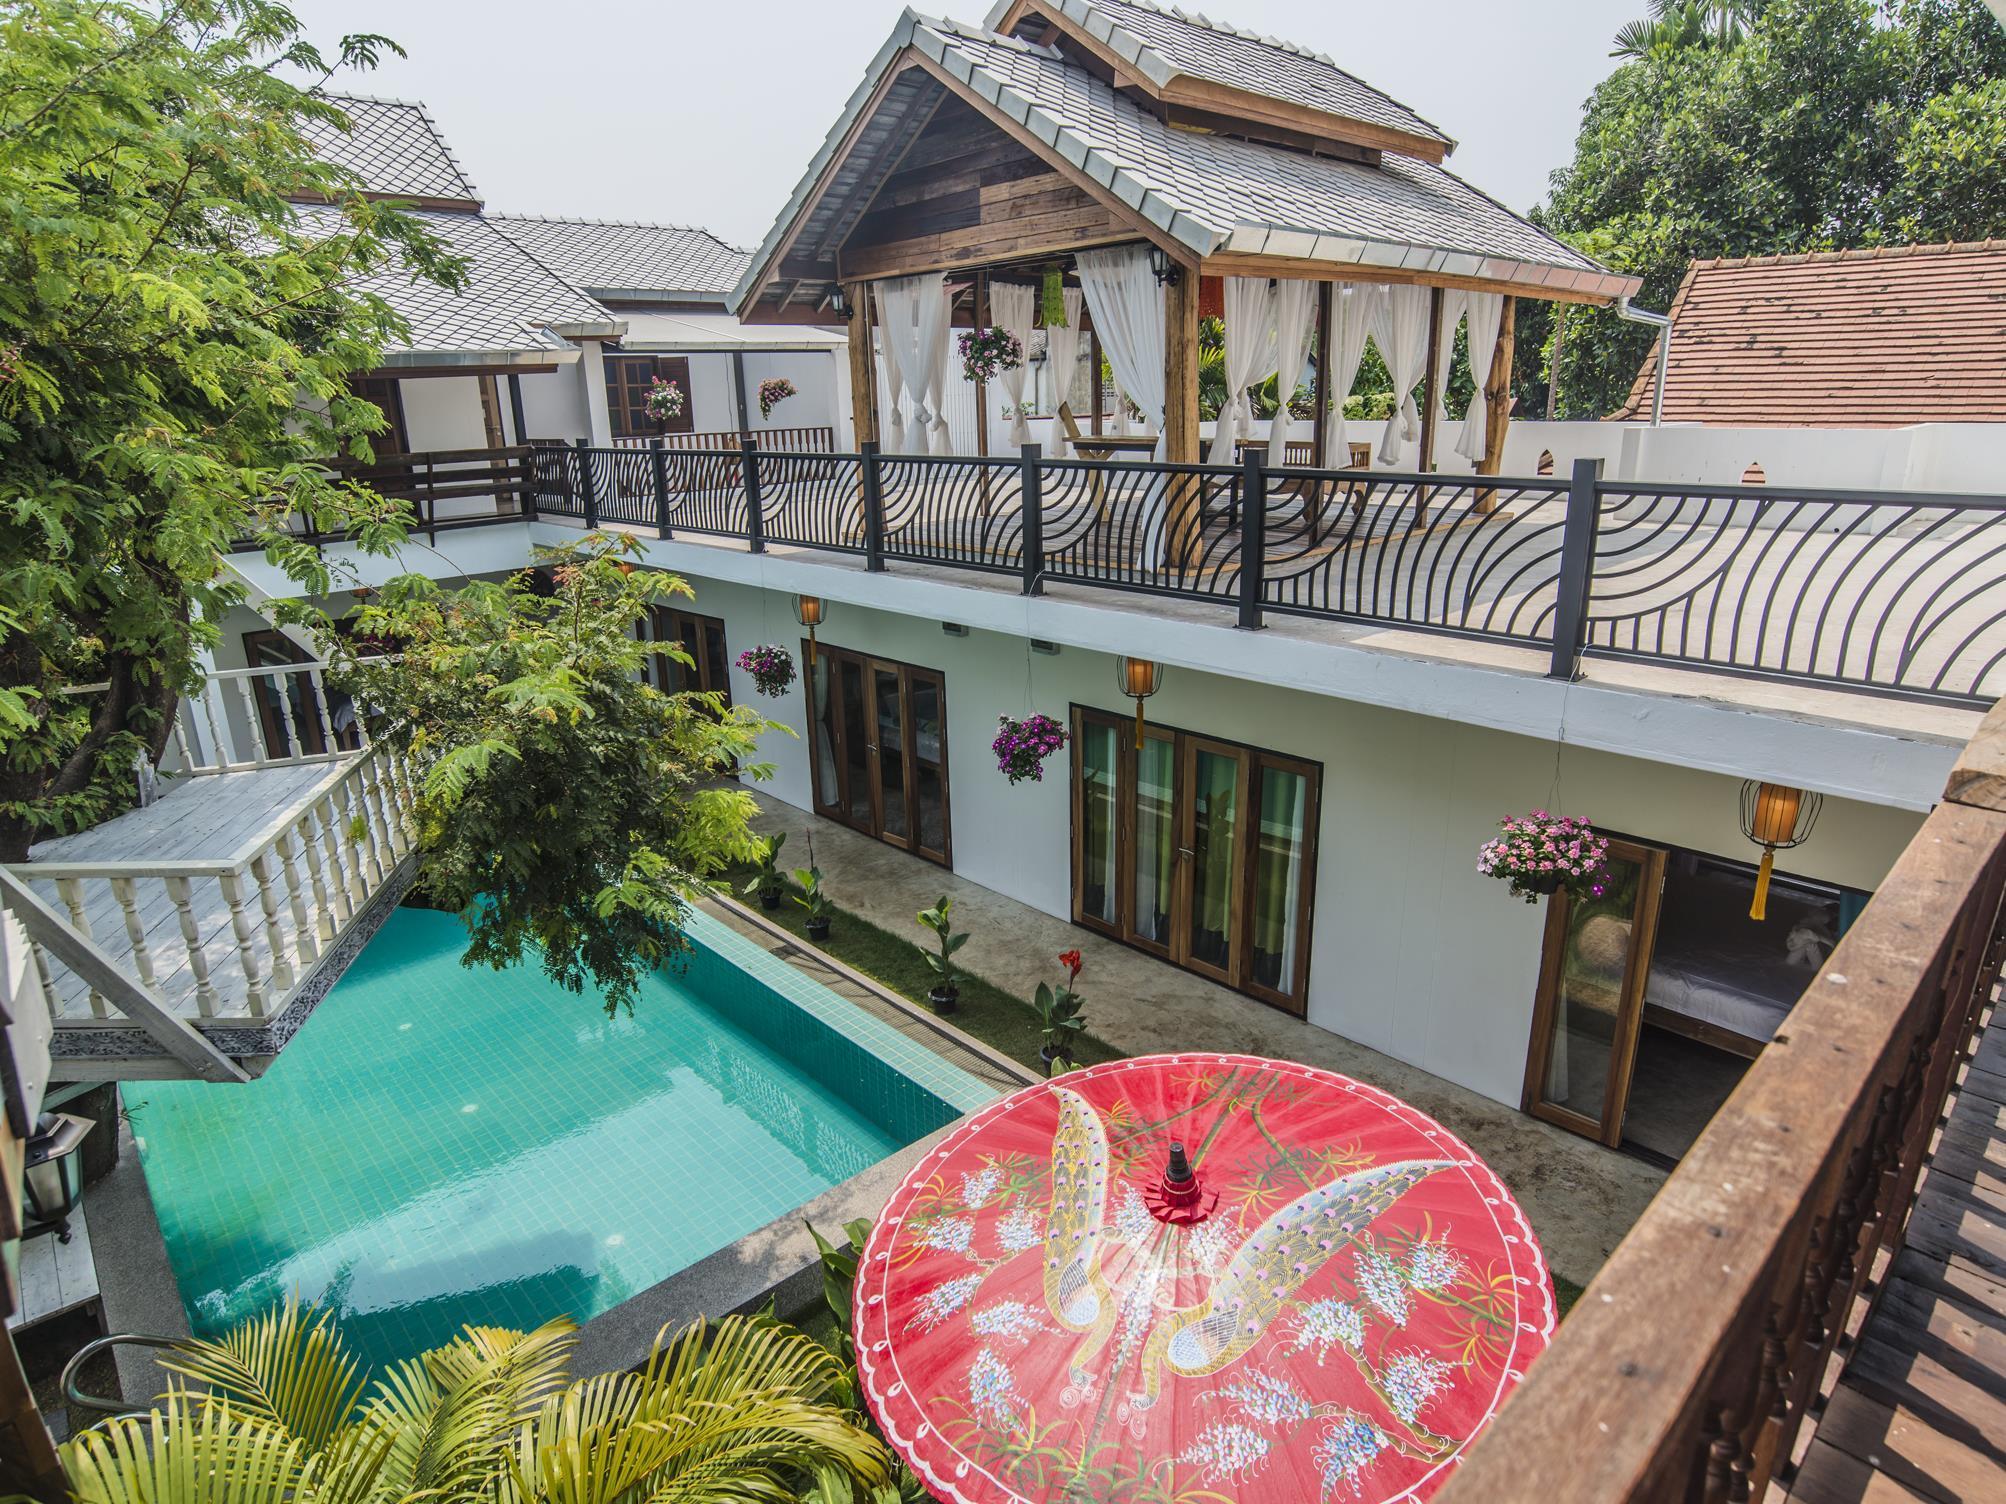 Garden Yard Inn Chiangmai การ์เดน ยาร์ด อินน์ เชียงใหม่